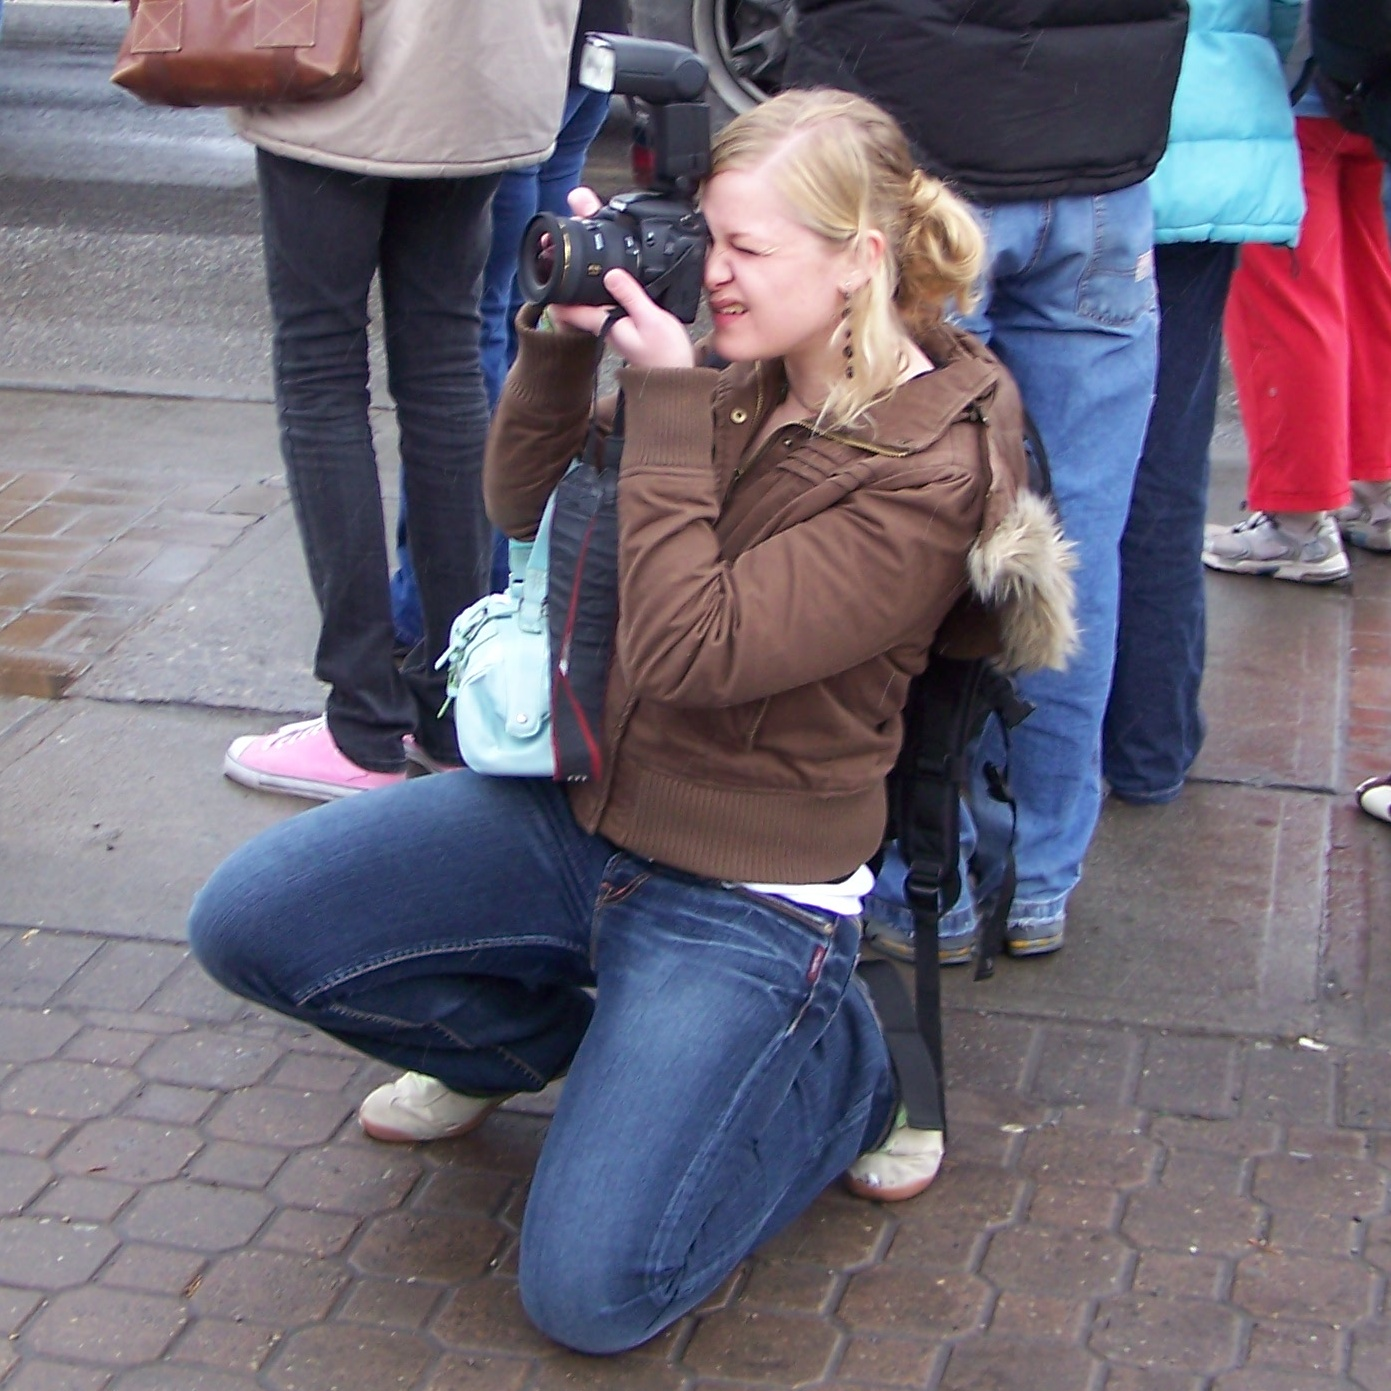 Taking photos in raw mode